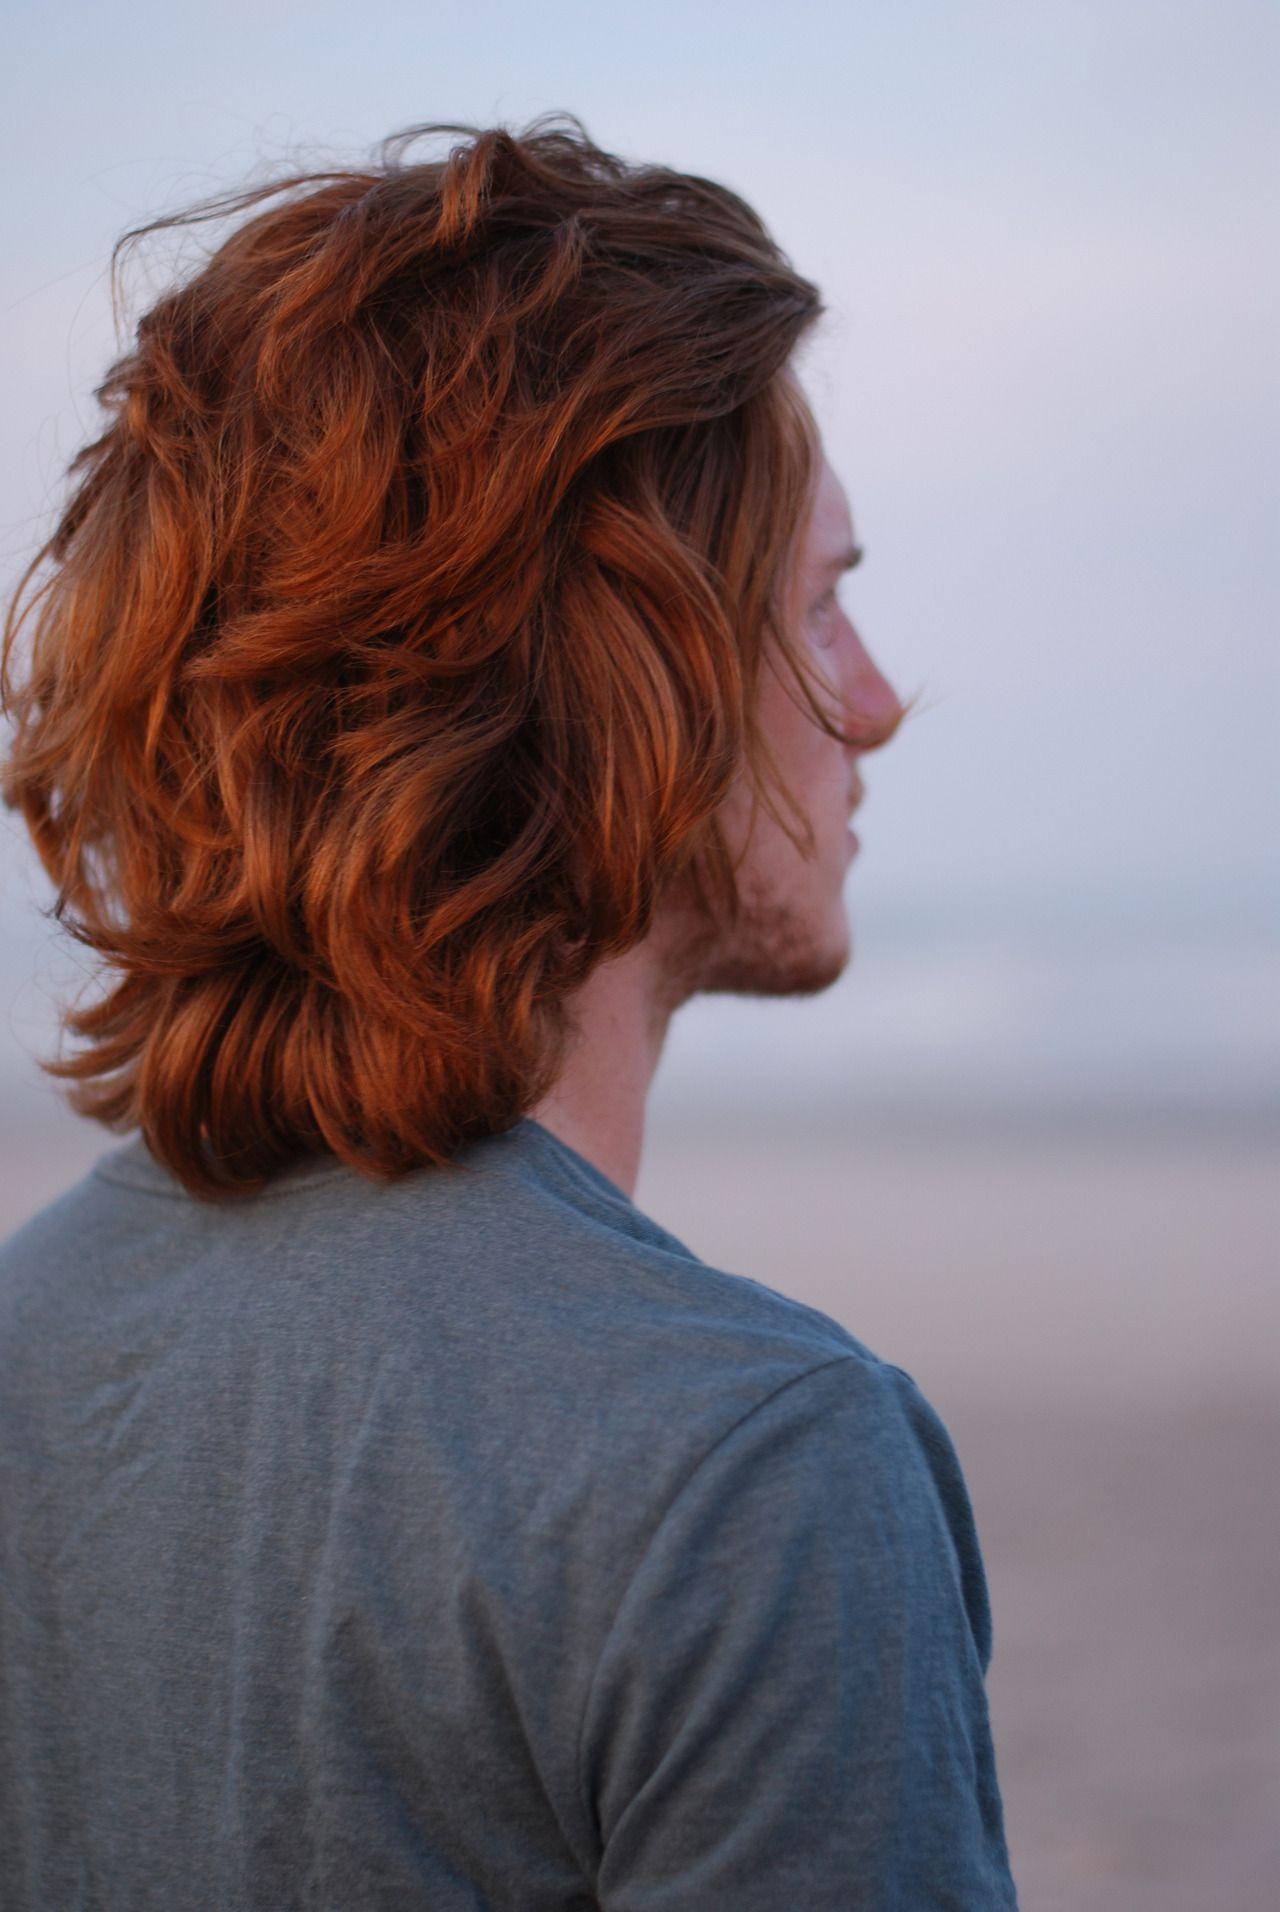 Tumblr Redheadpride Untitled By Vicesandvirtues Http Vicesandvirtues Tumblr Com Red Hair Boy Long Hair Styles Red Hair Men